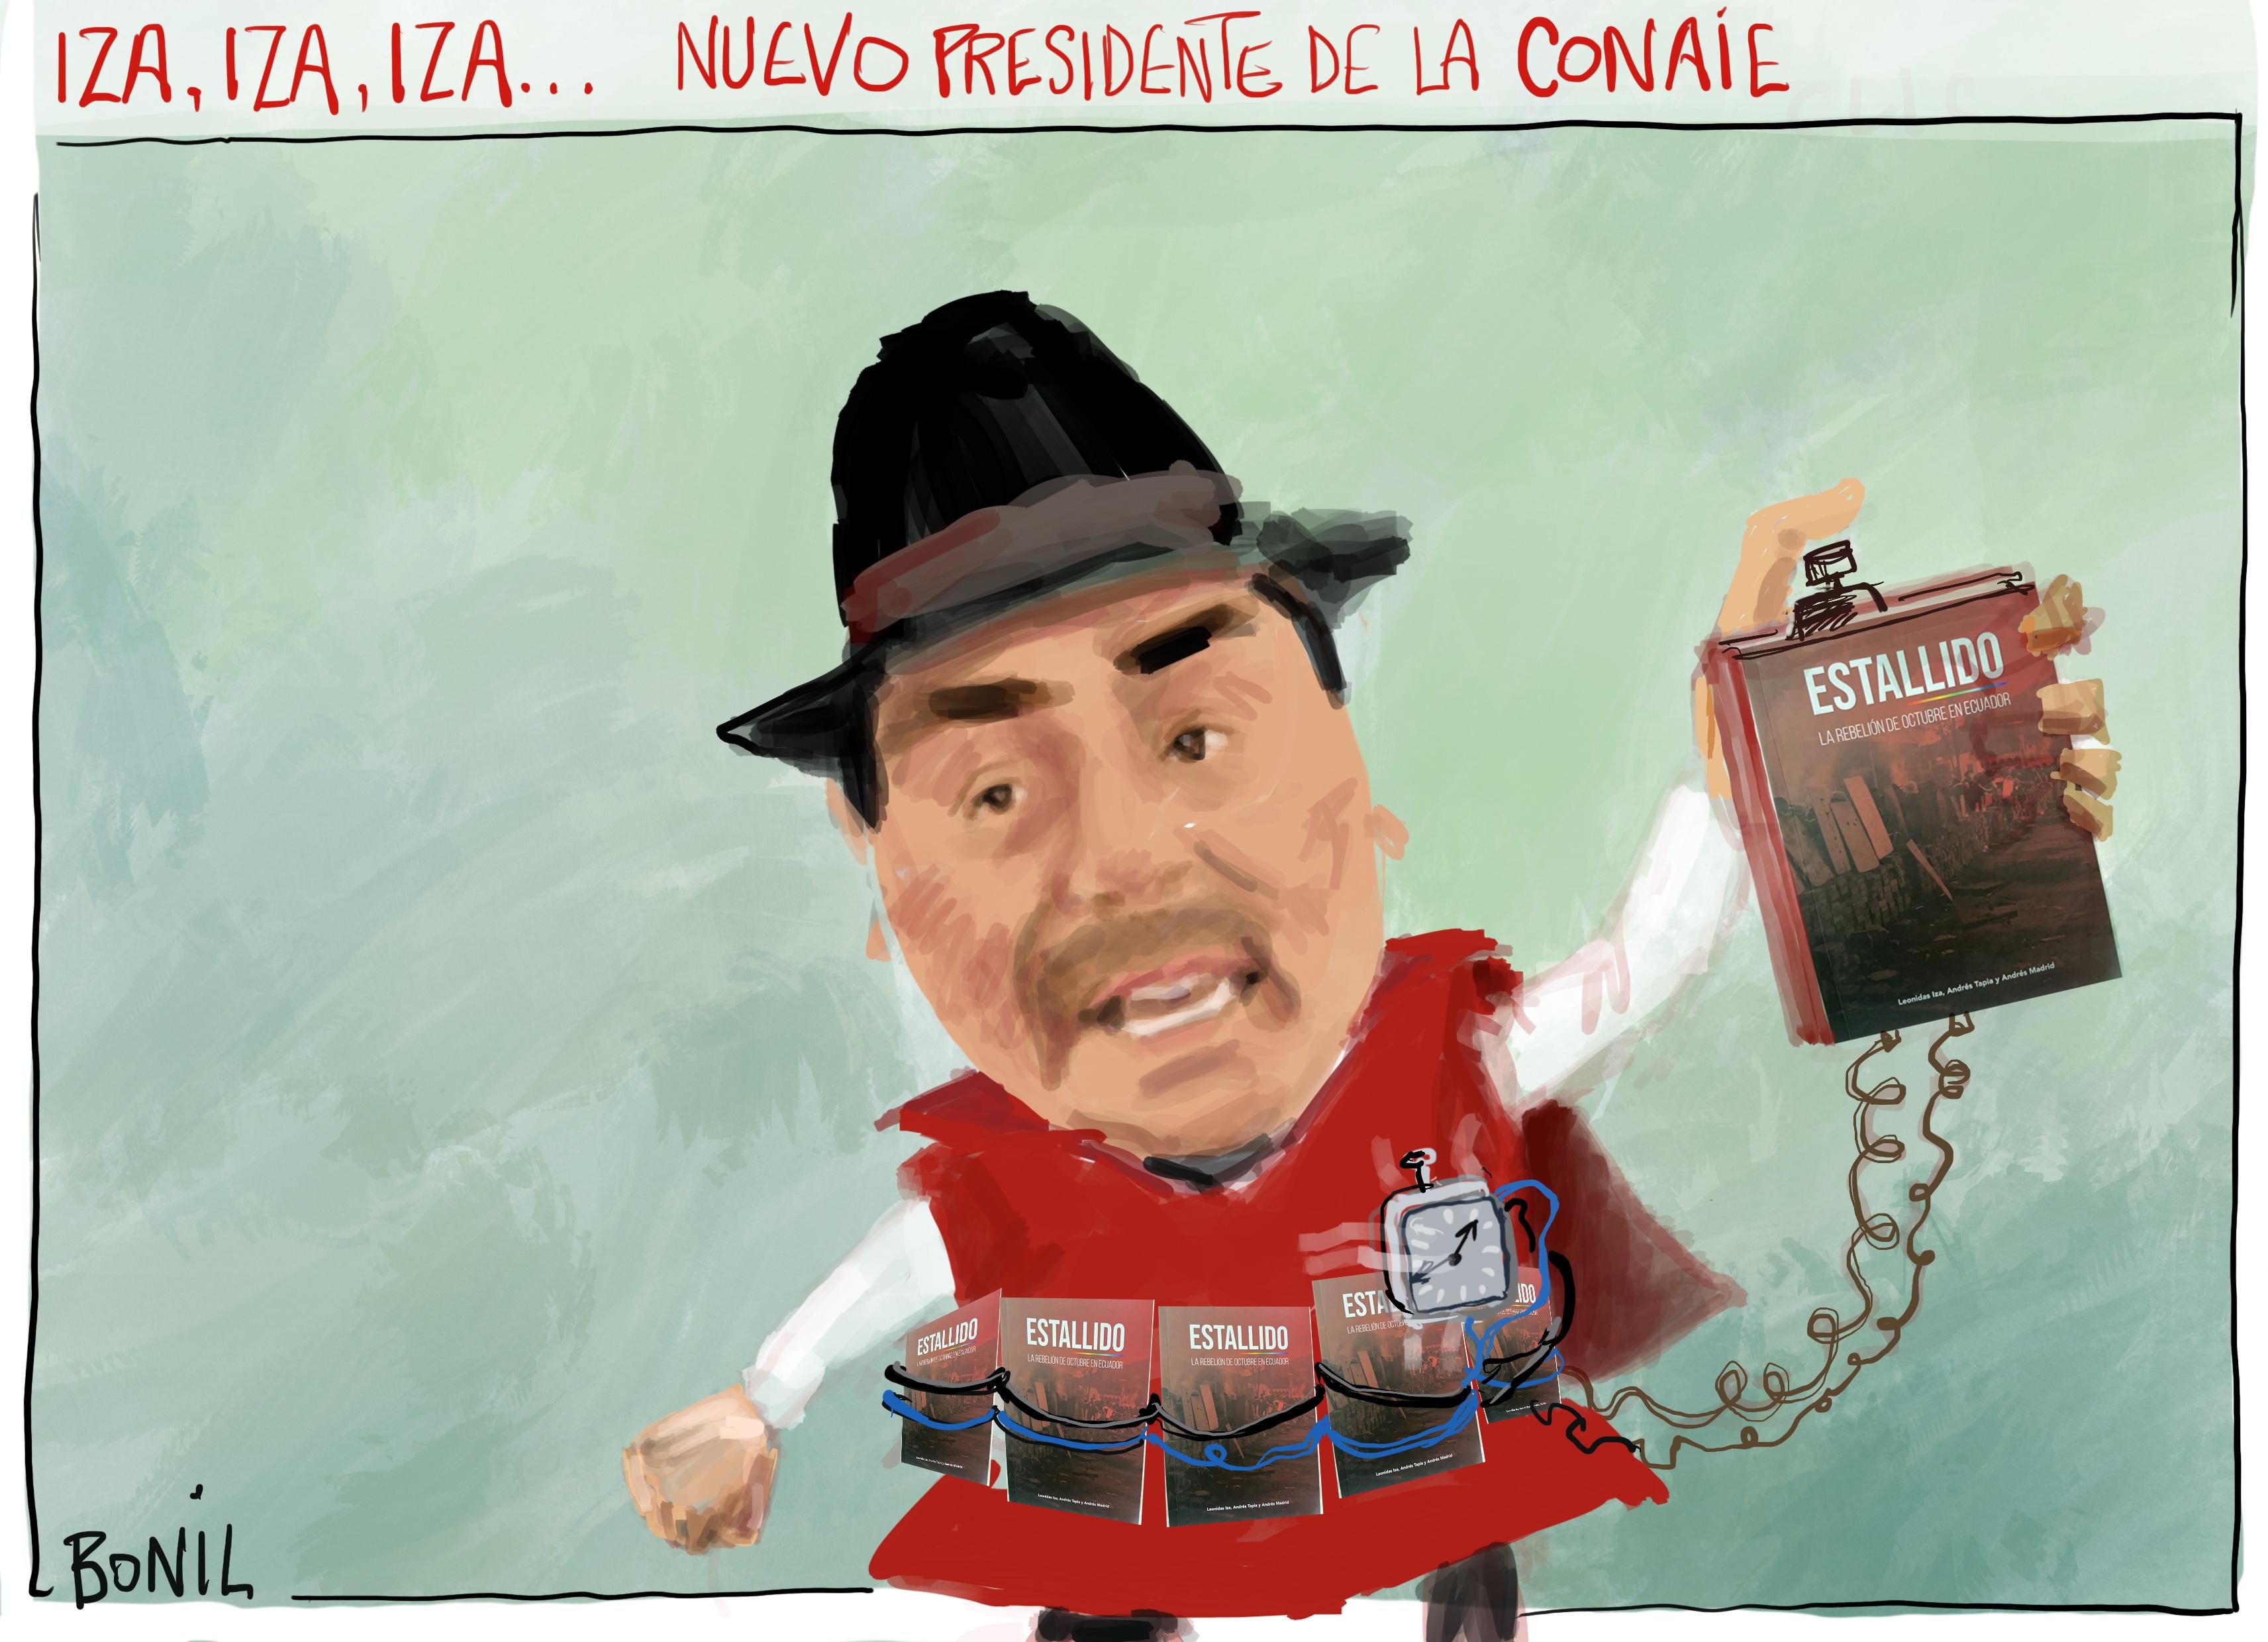 "Xavier Bonilla (BONIL) on Twitter: ""Leonidas Iza, presidente electo de la CONAIE https://t.co/IIuT9B4jiN"" / Twitter"